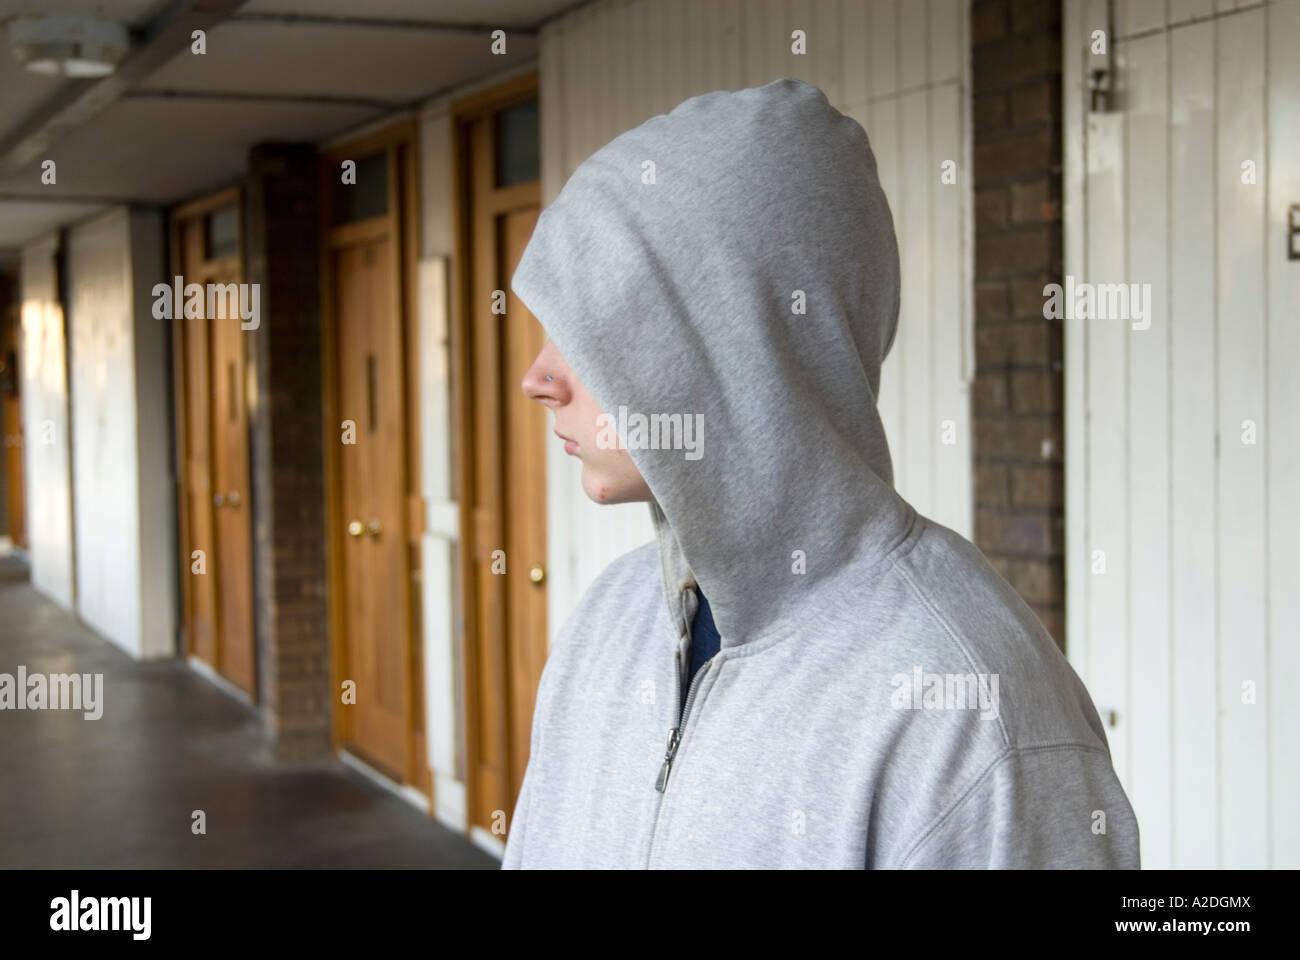 Teenager hanging around in hoodie clothing, London England UK - Stock Image